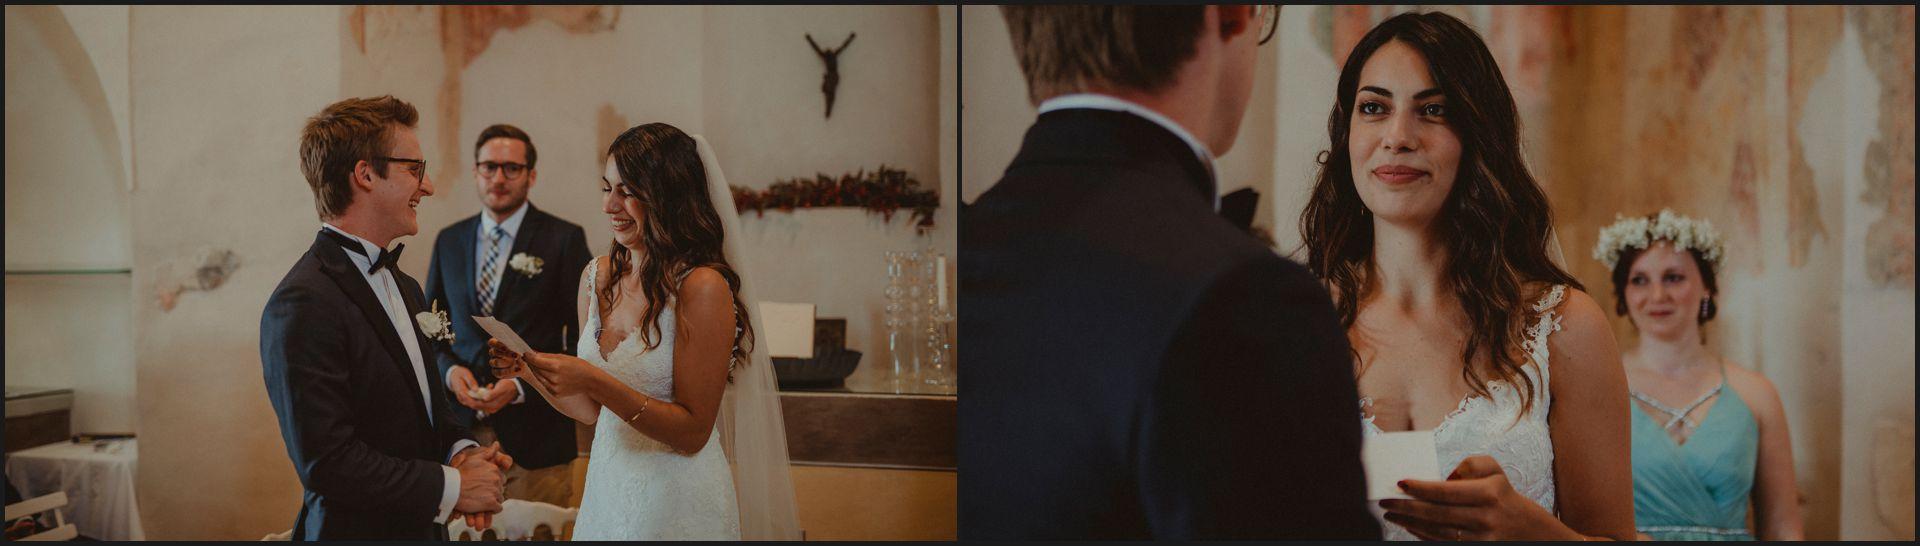 wedding, symbolic ceremony, wedding, umbria, nikis resort, vows, bride, groom